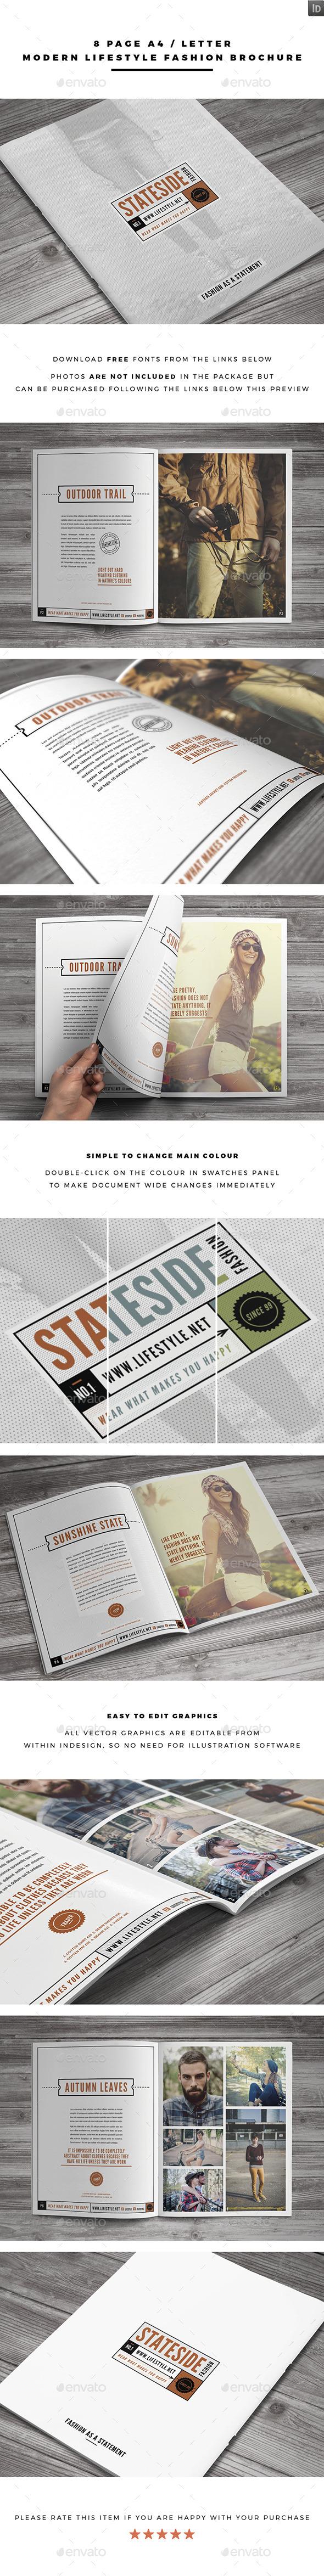 Modern Lifestyle Fashion Brochure - Brochures Print Templates